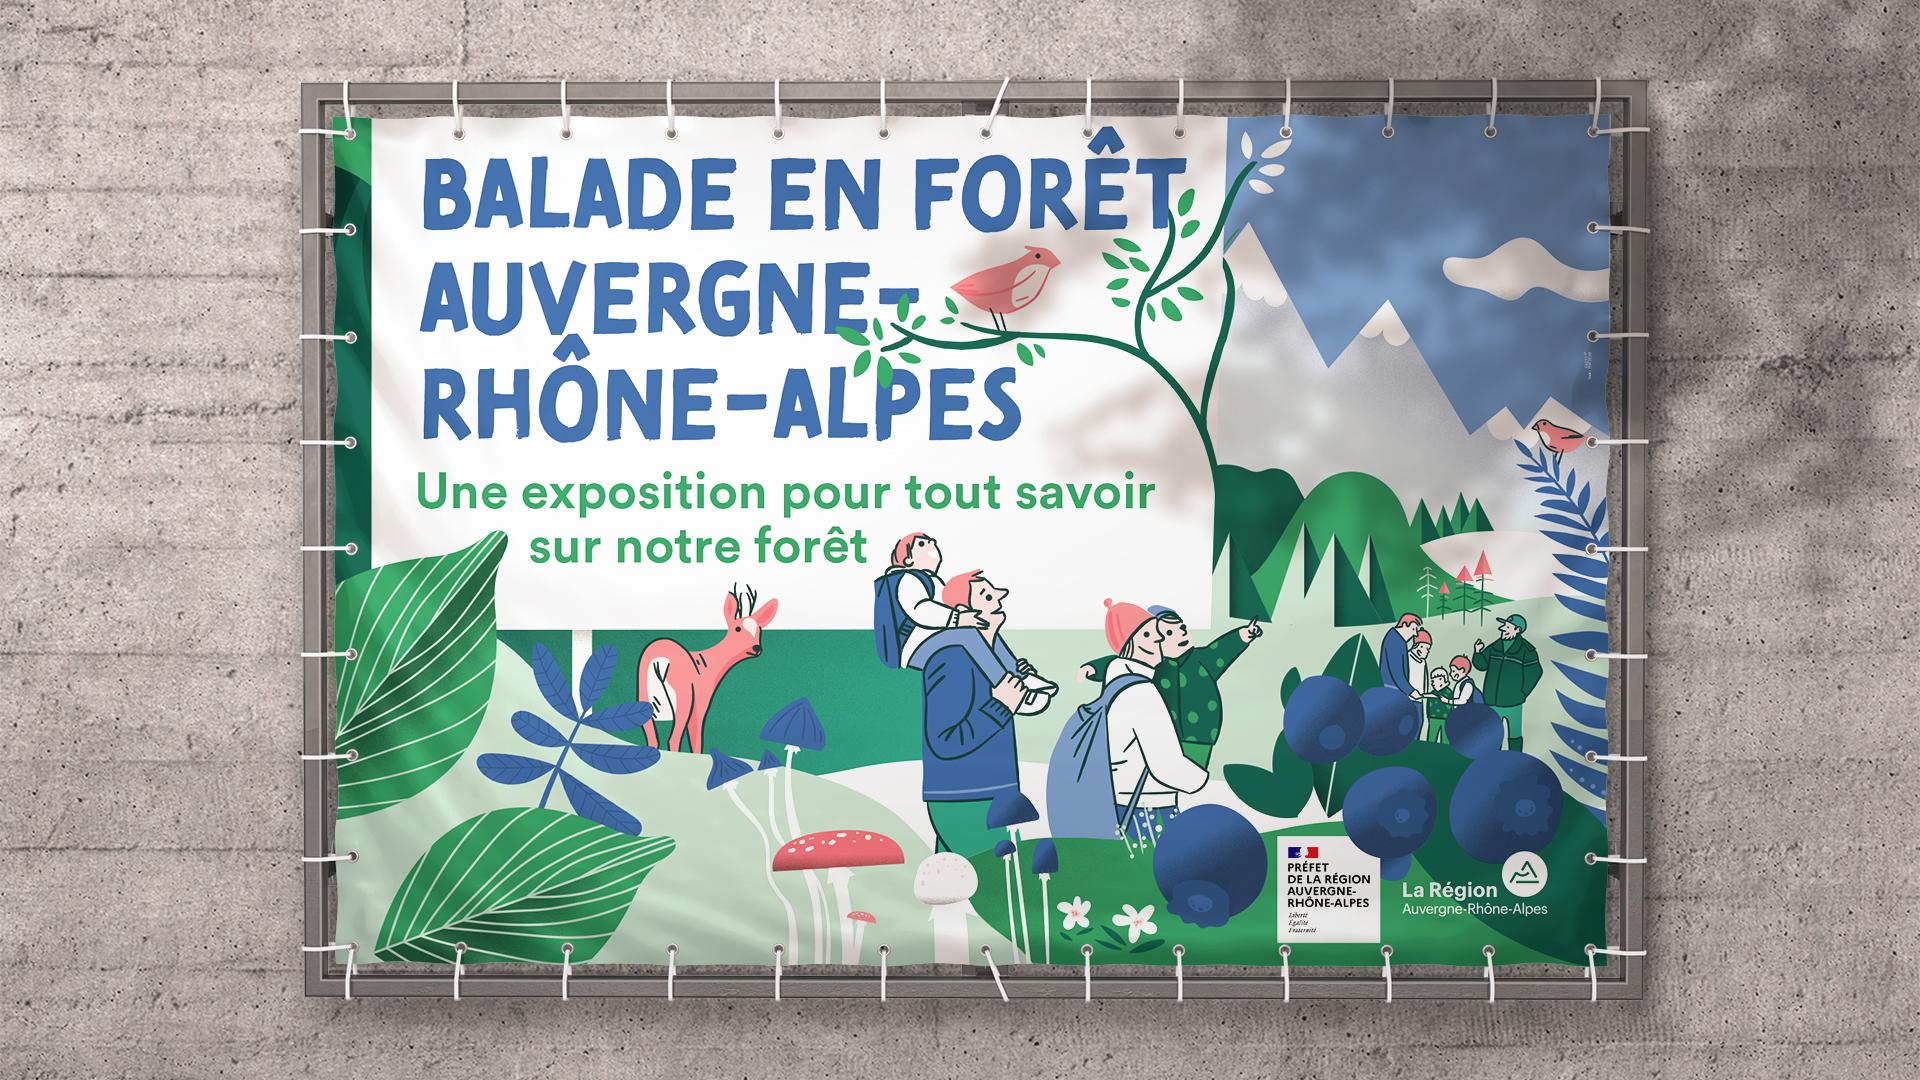 DRAAF_Region-Auvergne-Rhone-Alpes-Exposition-design-information-balade-foret-affiche-bache